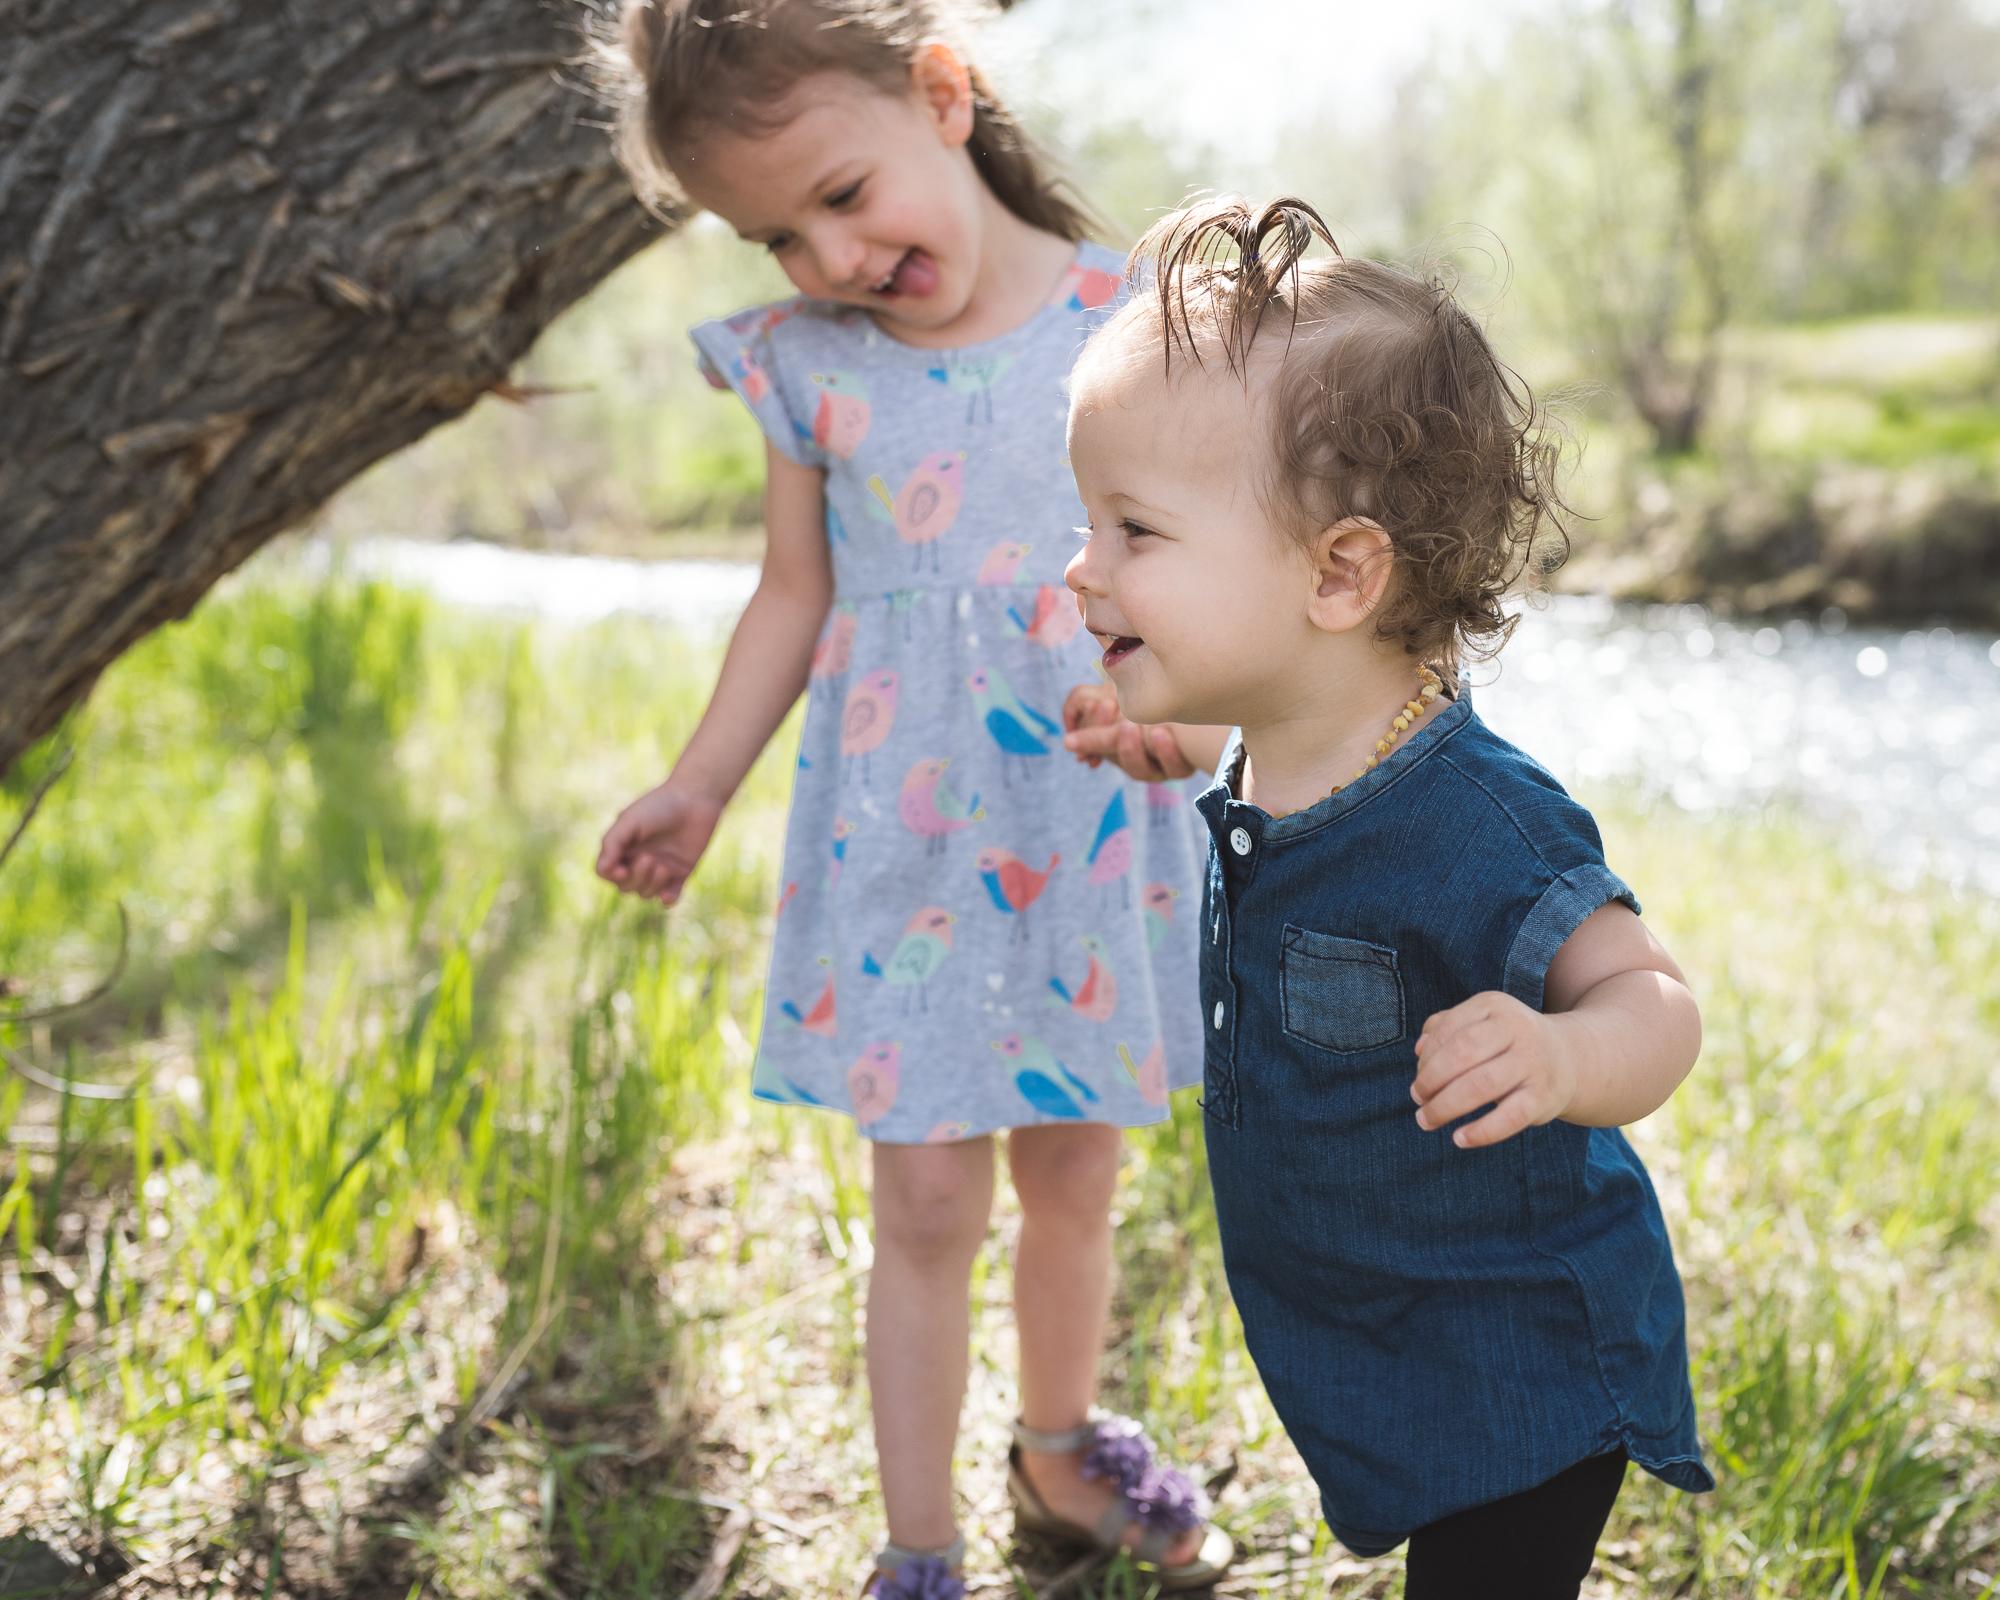 Denver+Boulder+Lifestyle+Family+Photographer+MiniSessions+JennyFolmanPhotography-5.jpg